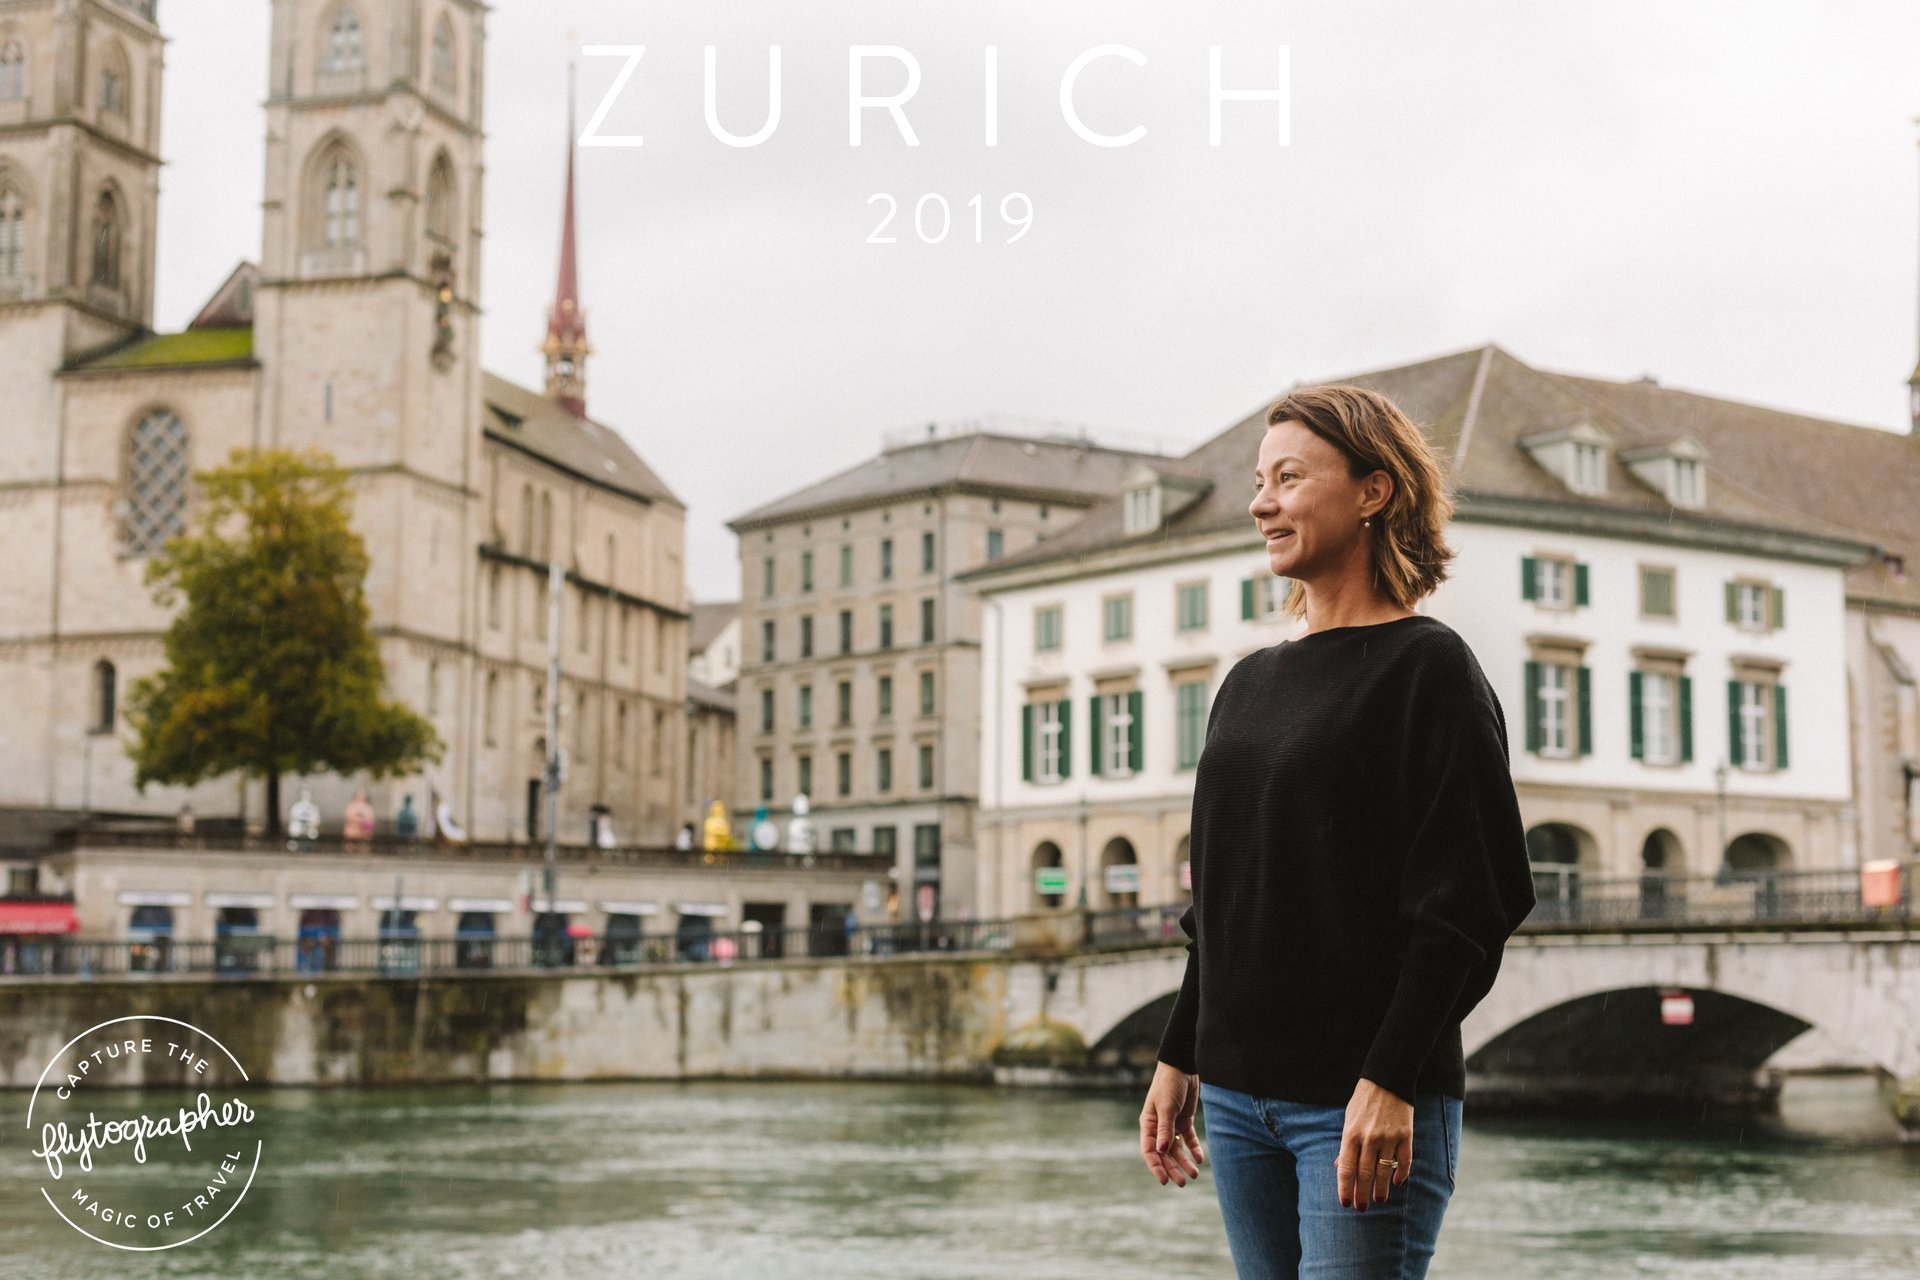 Zurich-Switzerland-travel-story-Flytographer-9